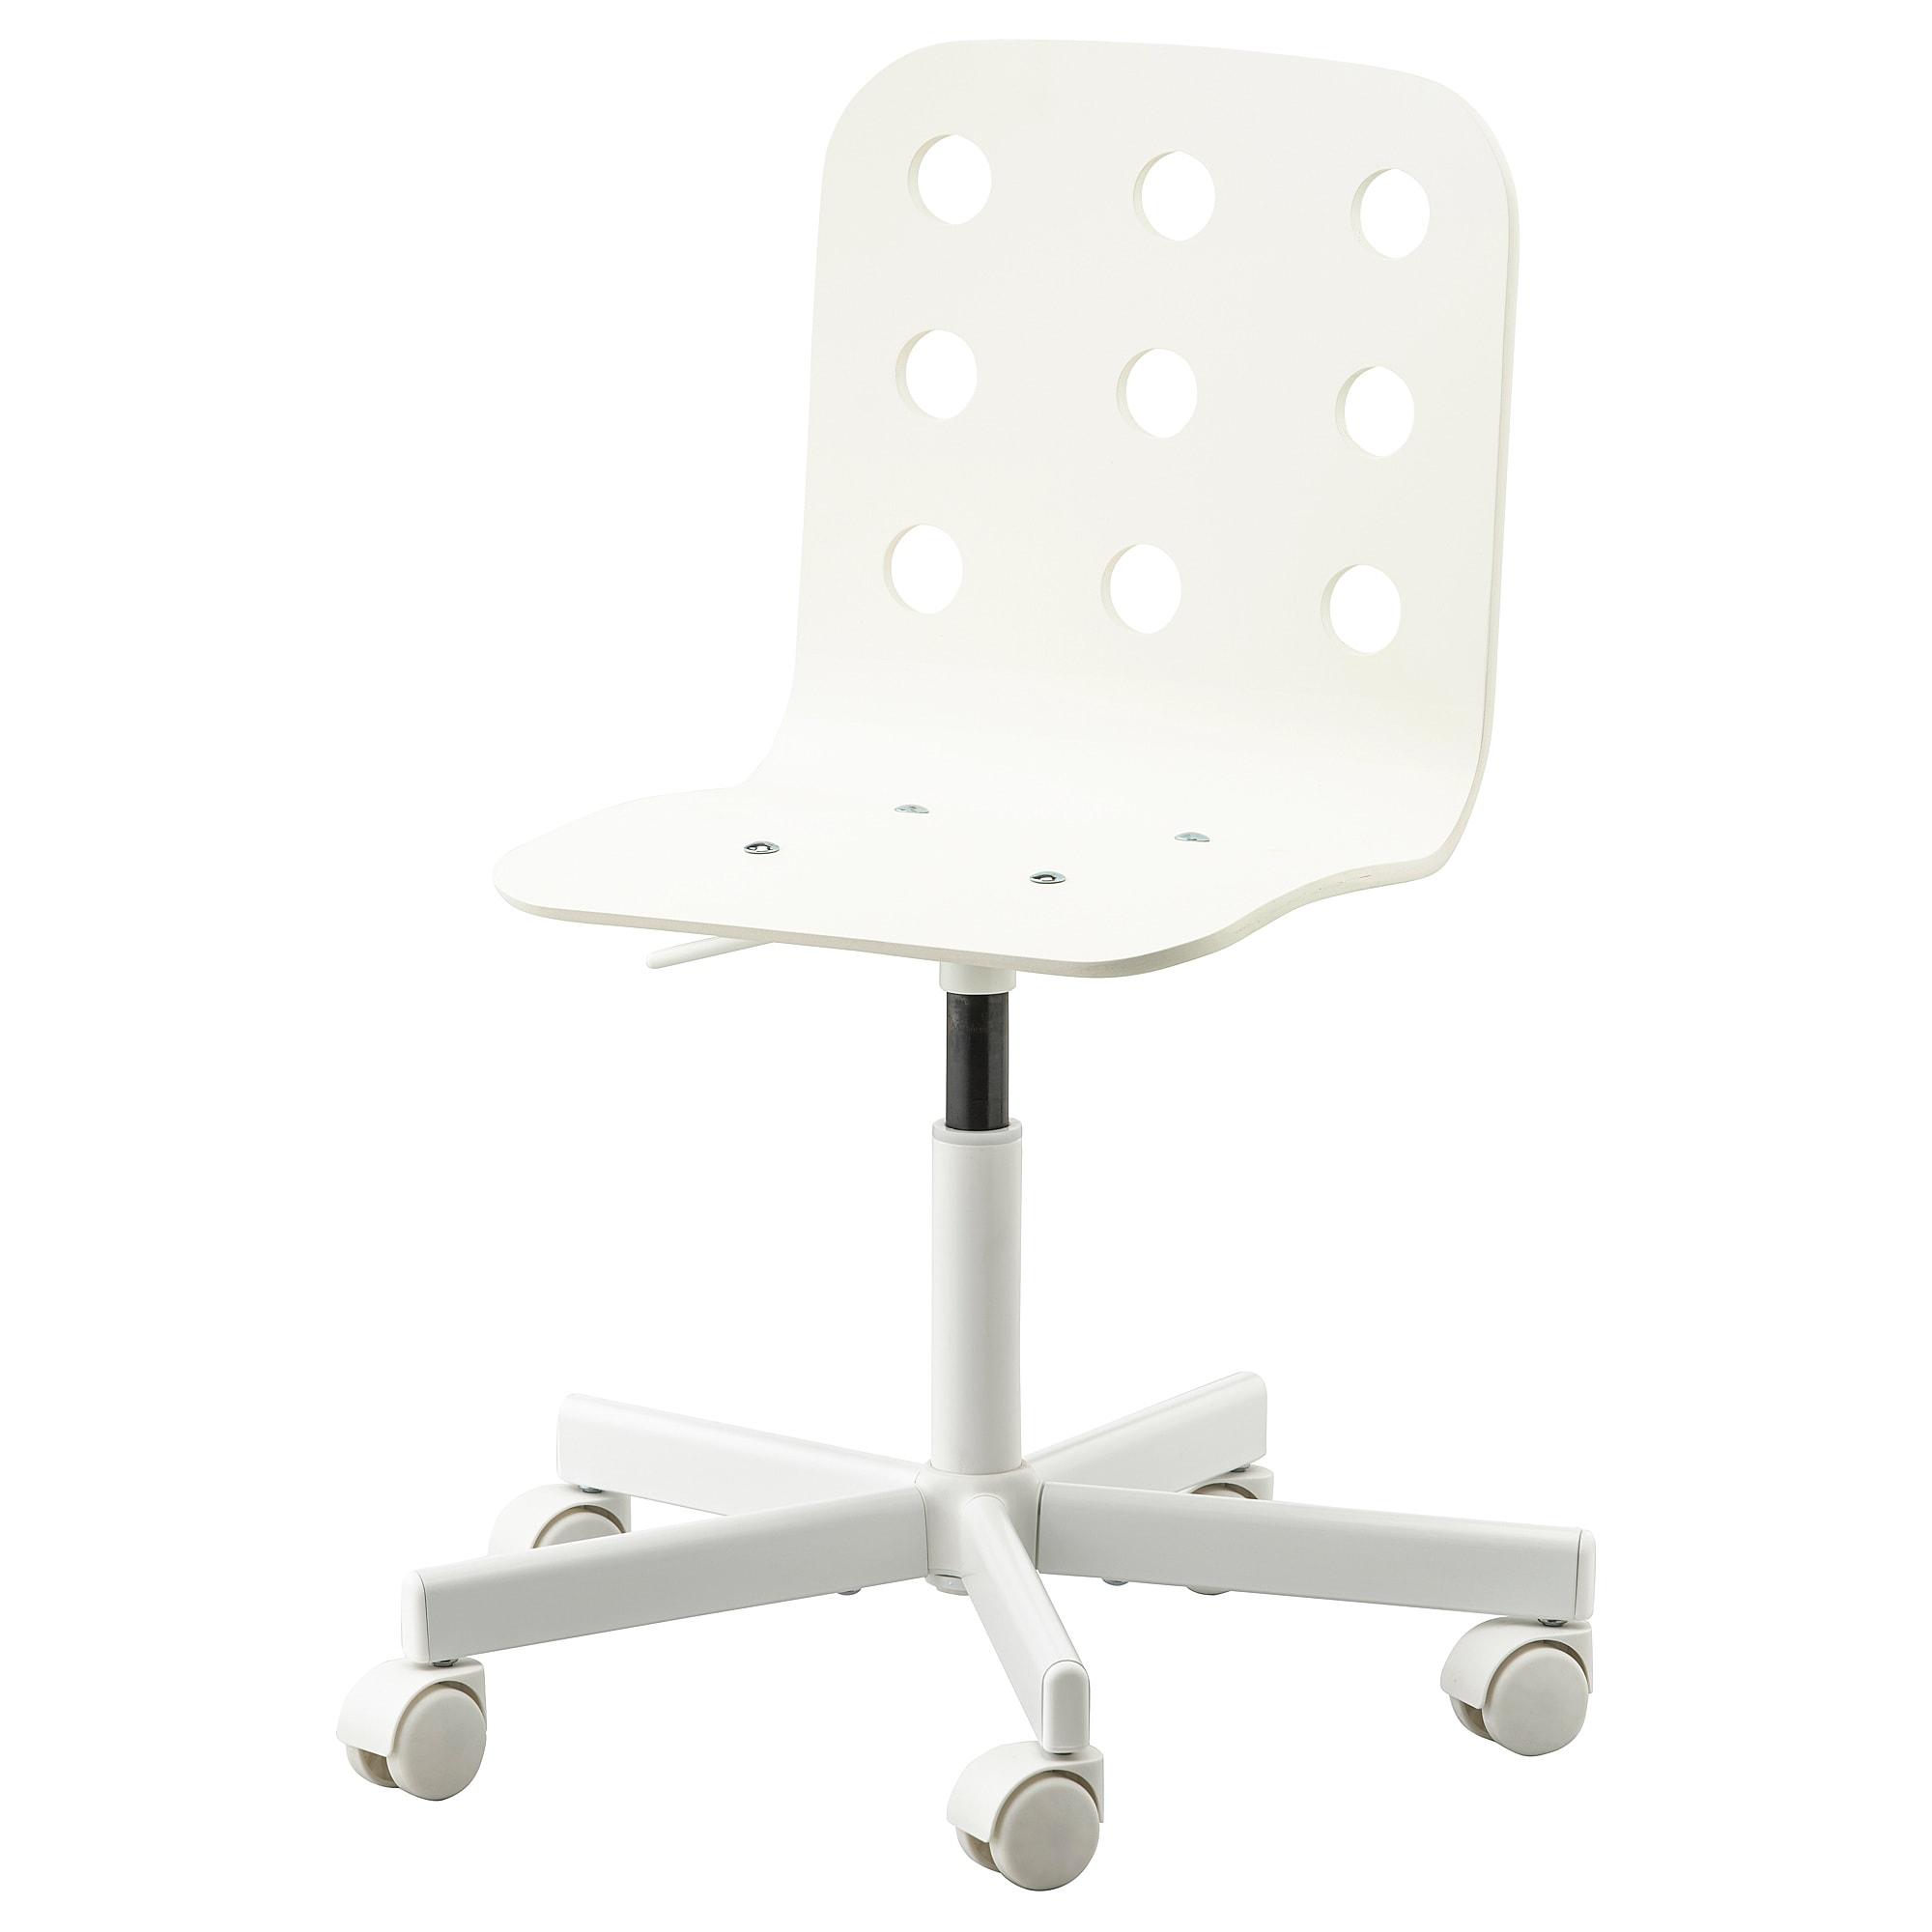 Ikea Jules White Child S Desk Chair Childrens Desk Desk Chair